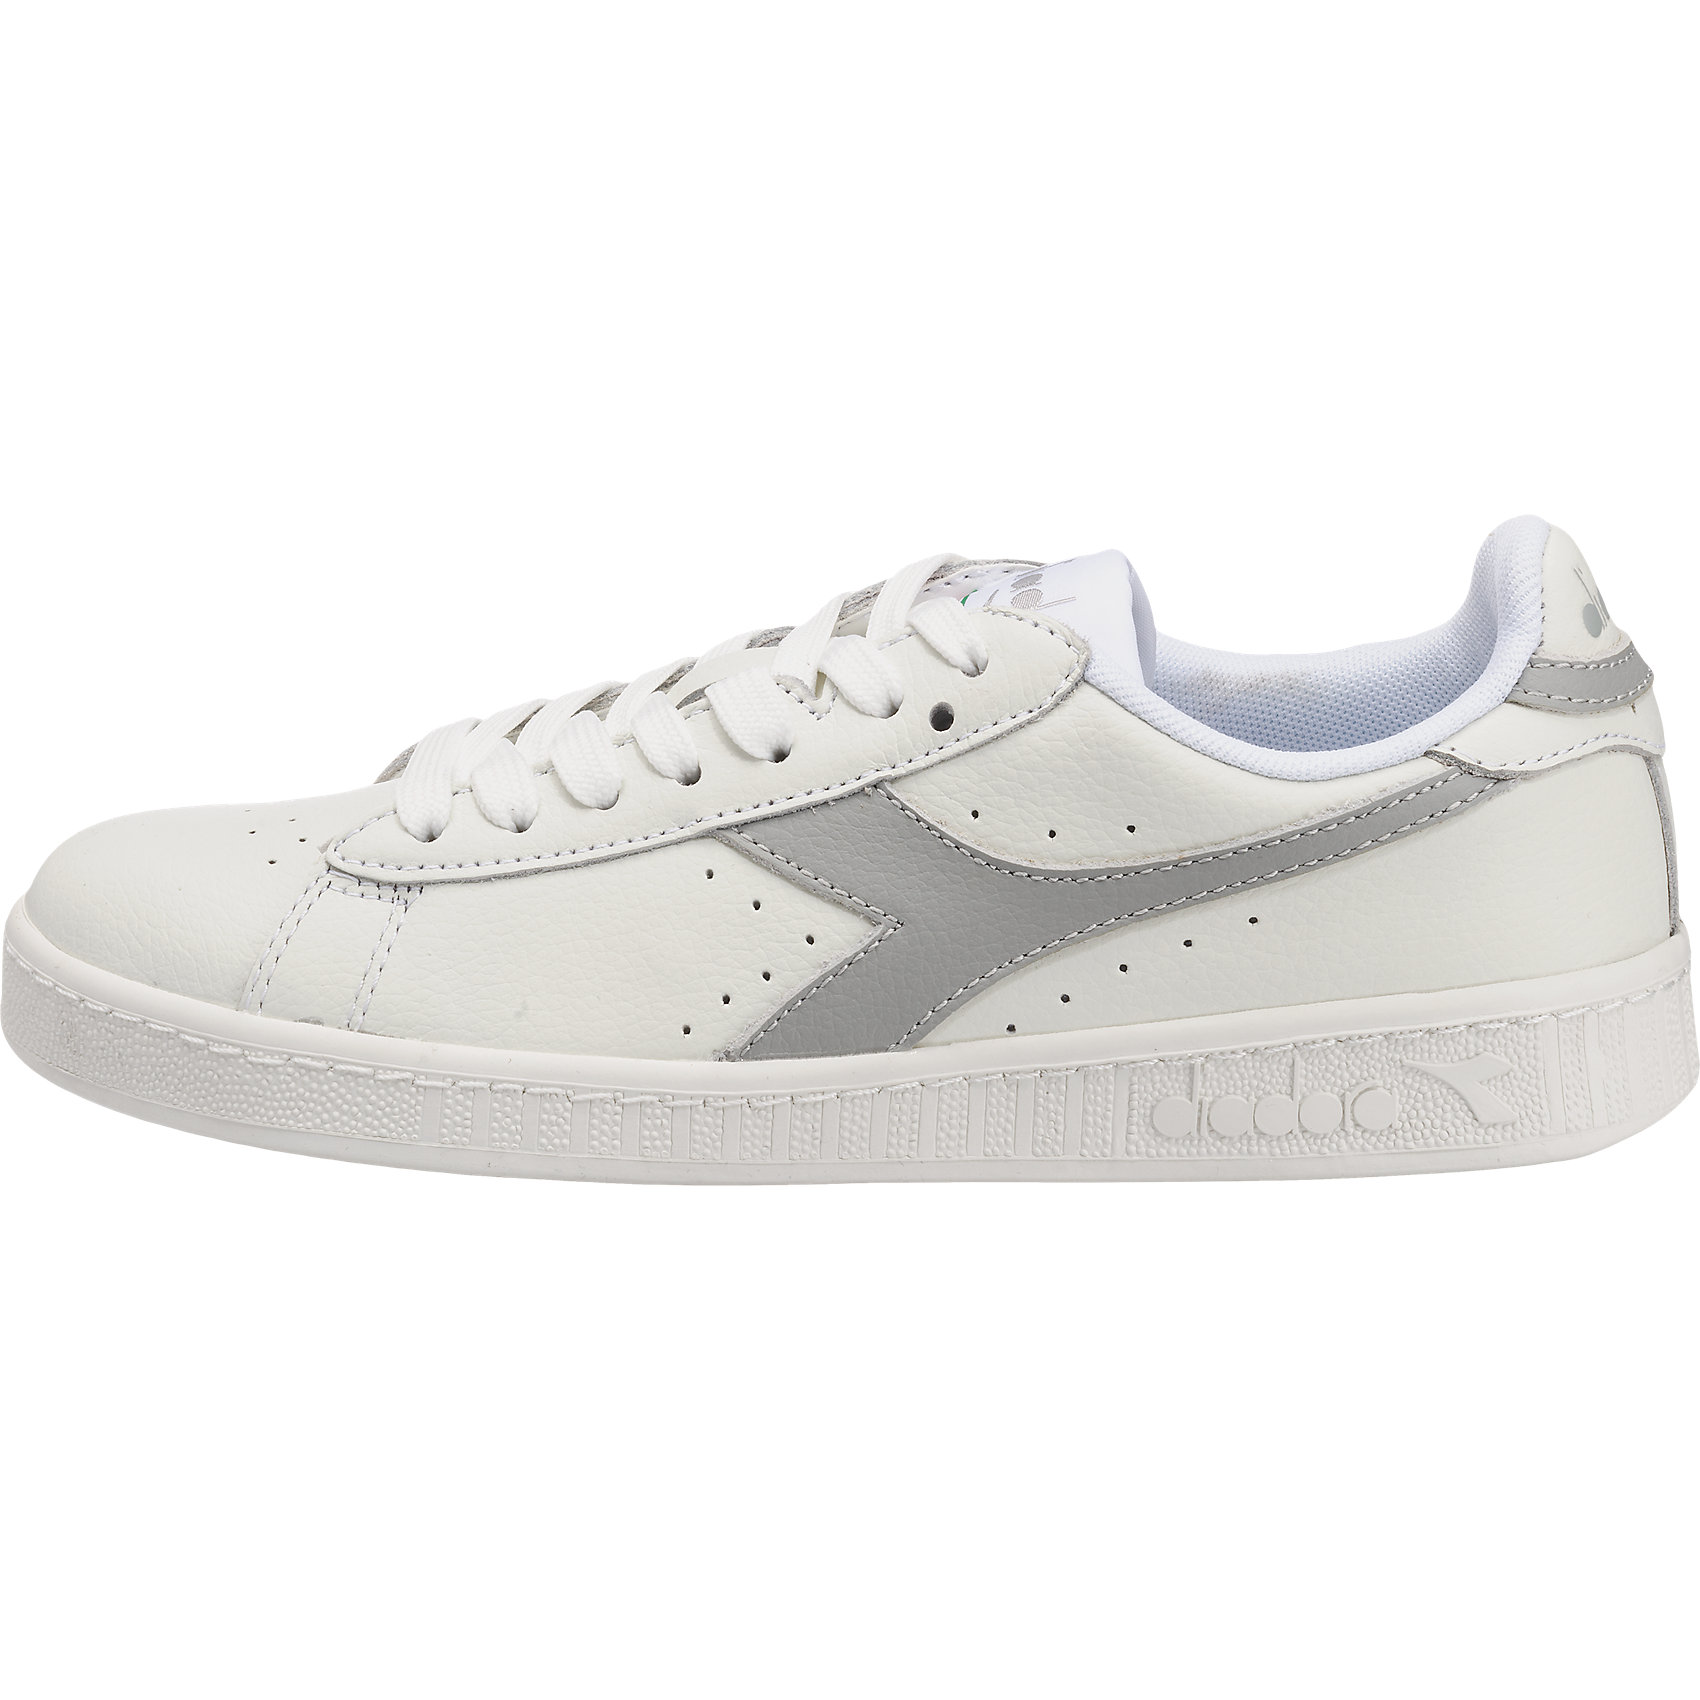 Neu-Diadora-Game-L-Low-Sneakers-5774976-fuer-